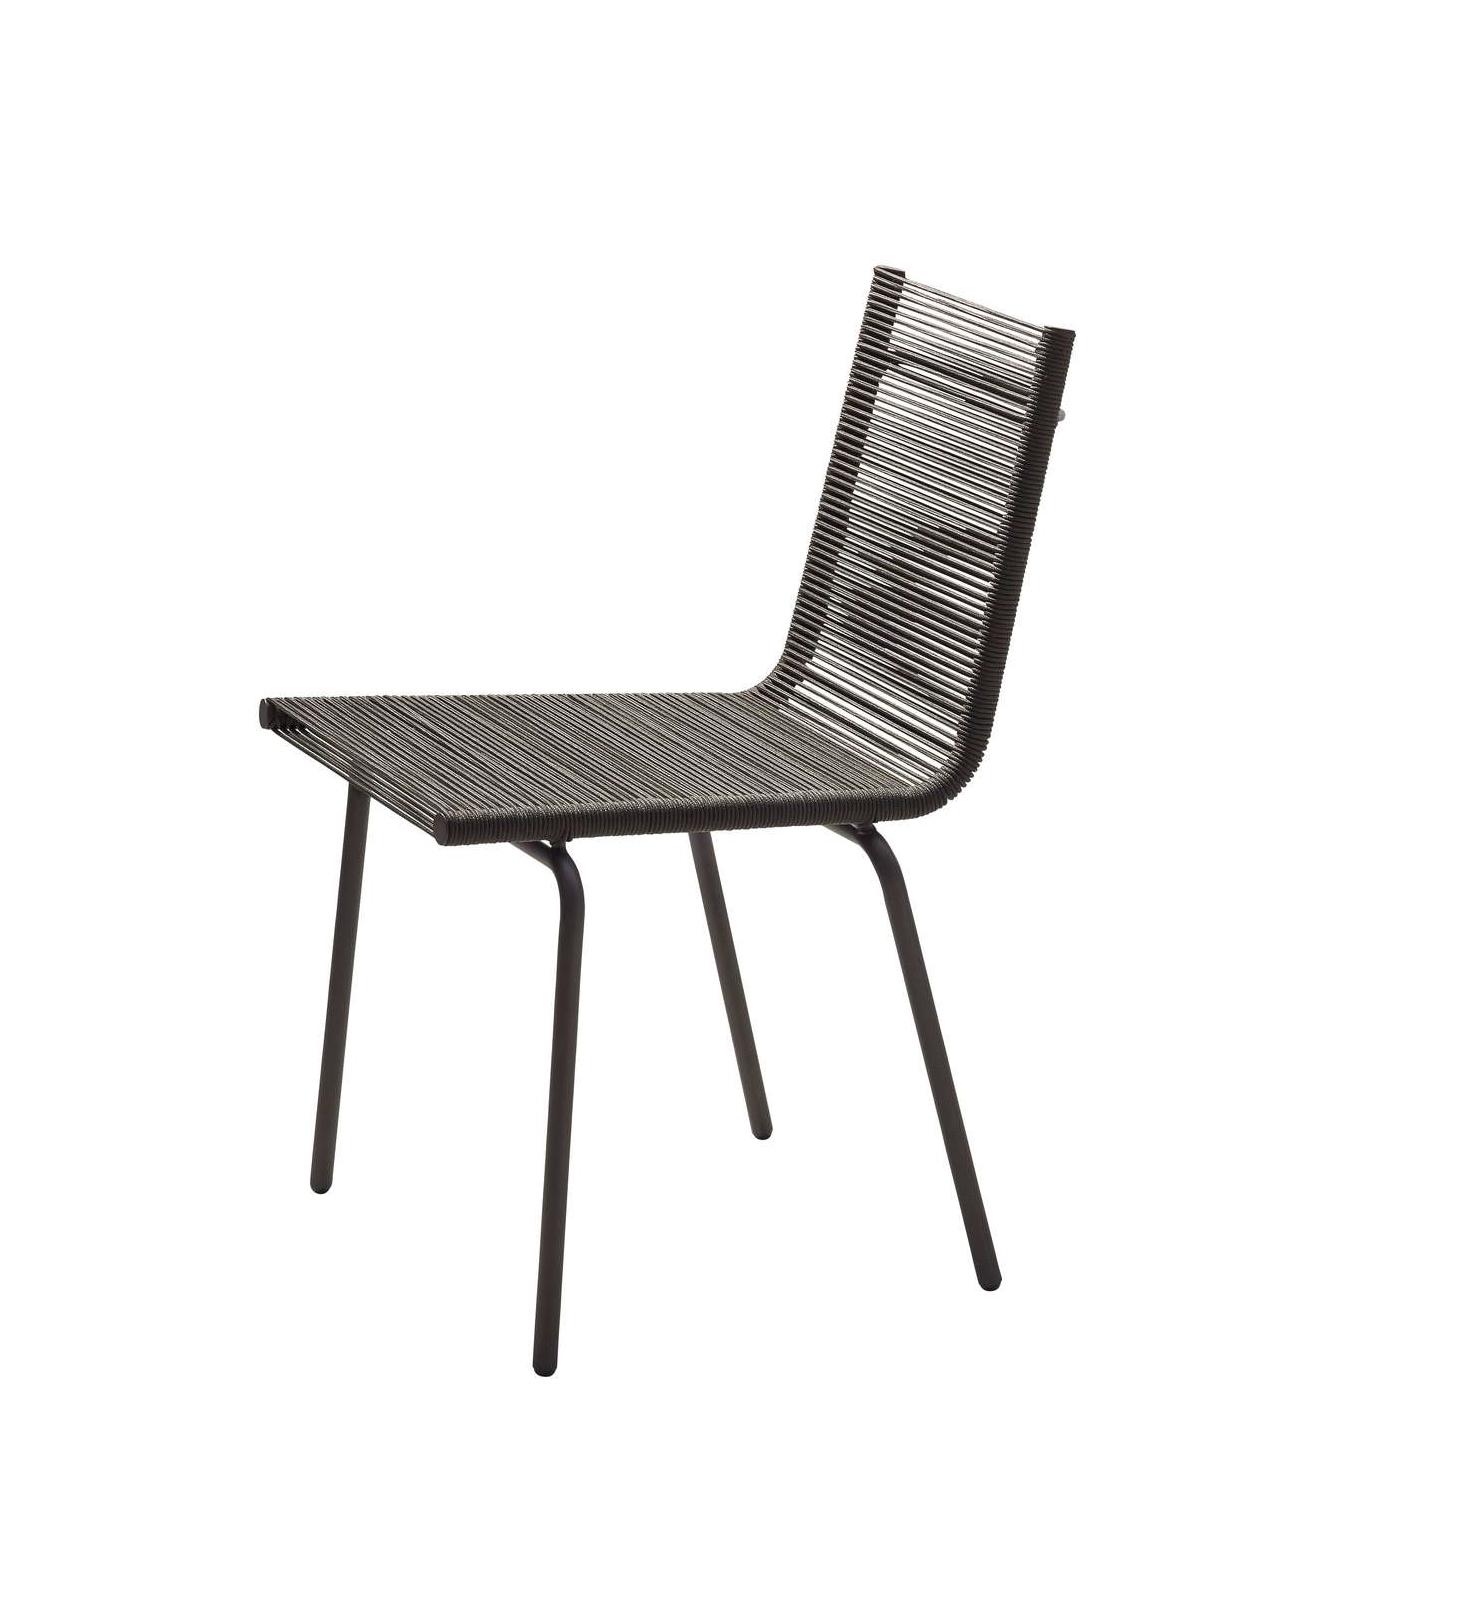 SIDD stol utan armstöd brun fiber, Cane-line